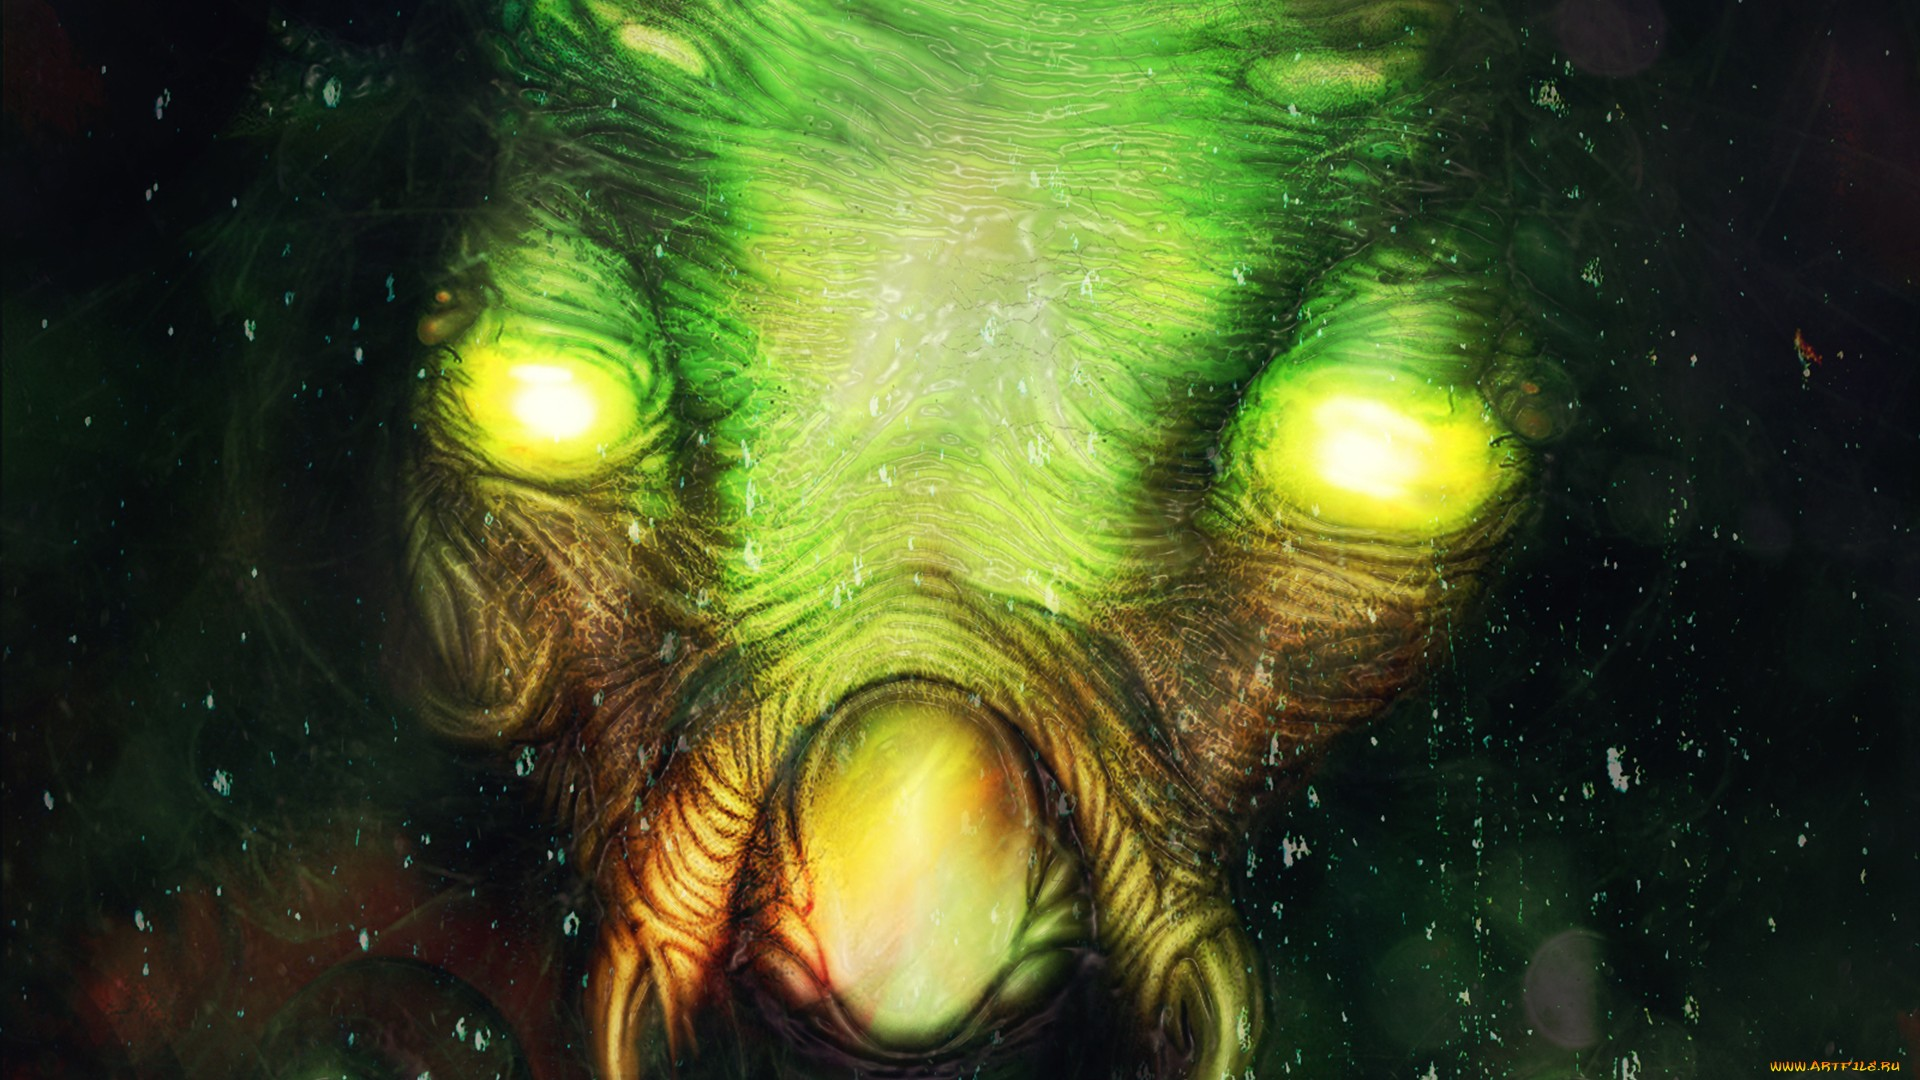 Alien Full HD Papel De Parede And Planos De Fundo